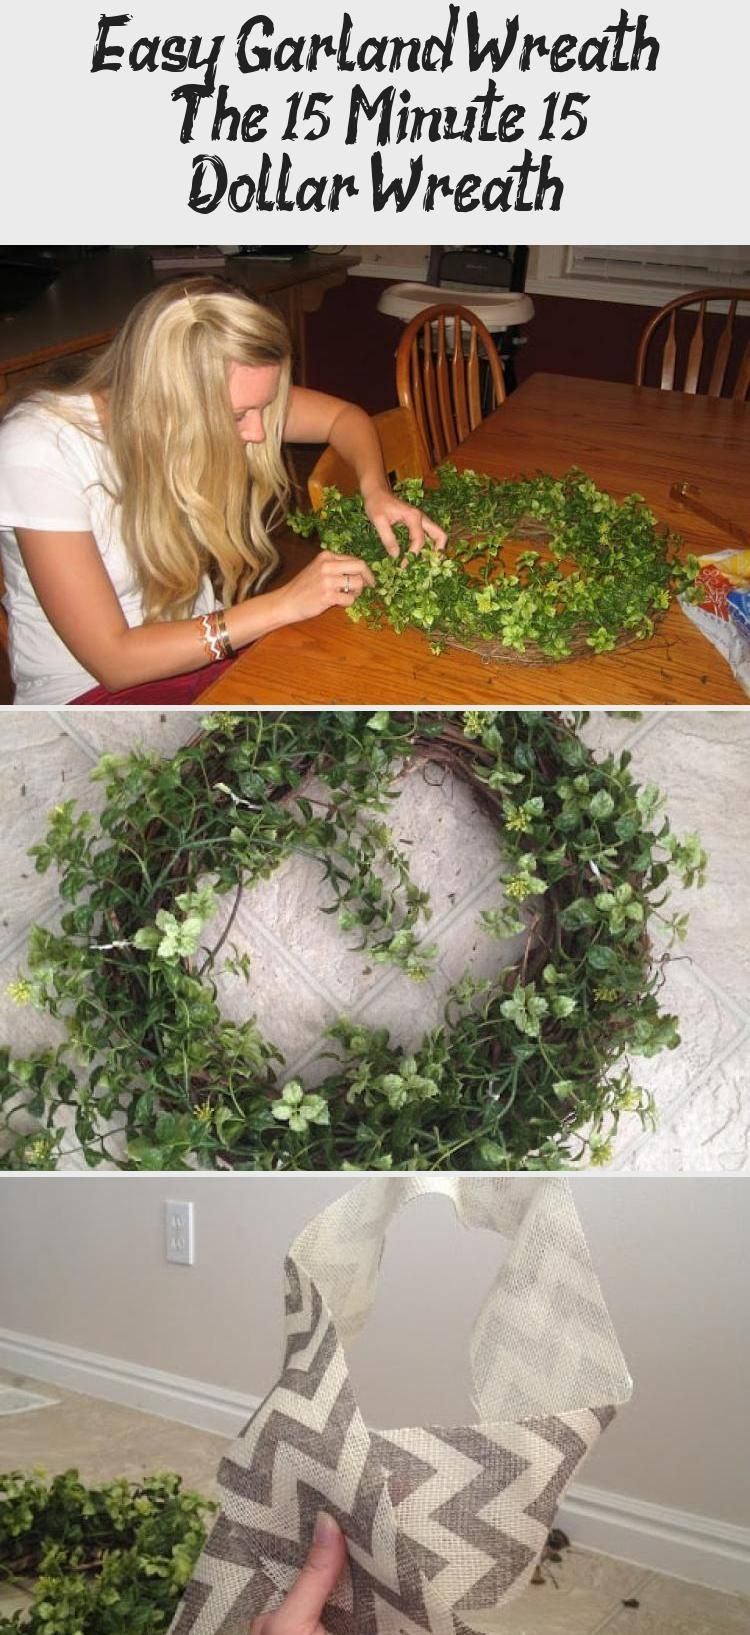 Easy Garland Wreath – The 15 Minute, 15 Dollar Wreath - DIY,  #DIY #Dollar #Easy #Garland #grapevinewreathdiydollarstores #Minute #wreath